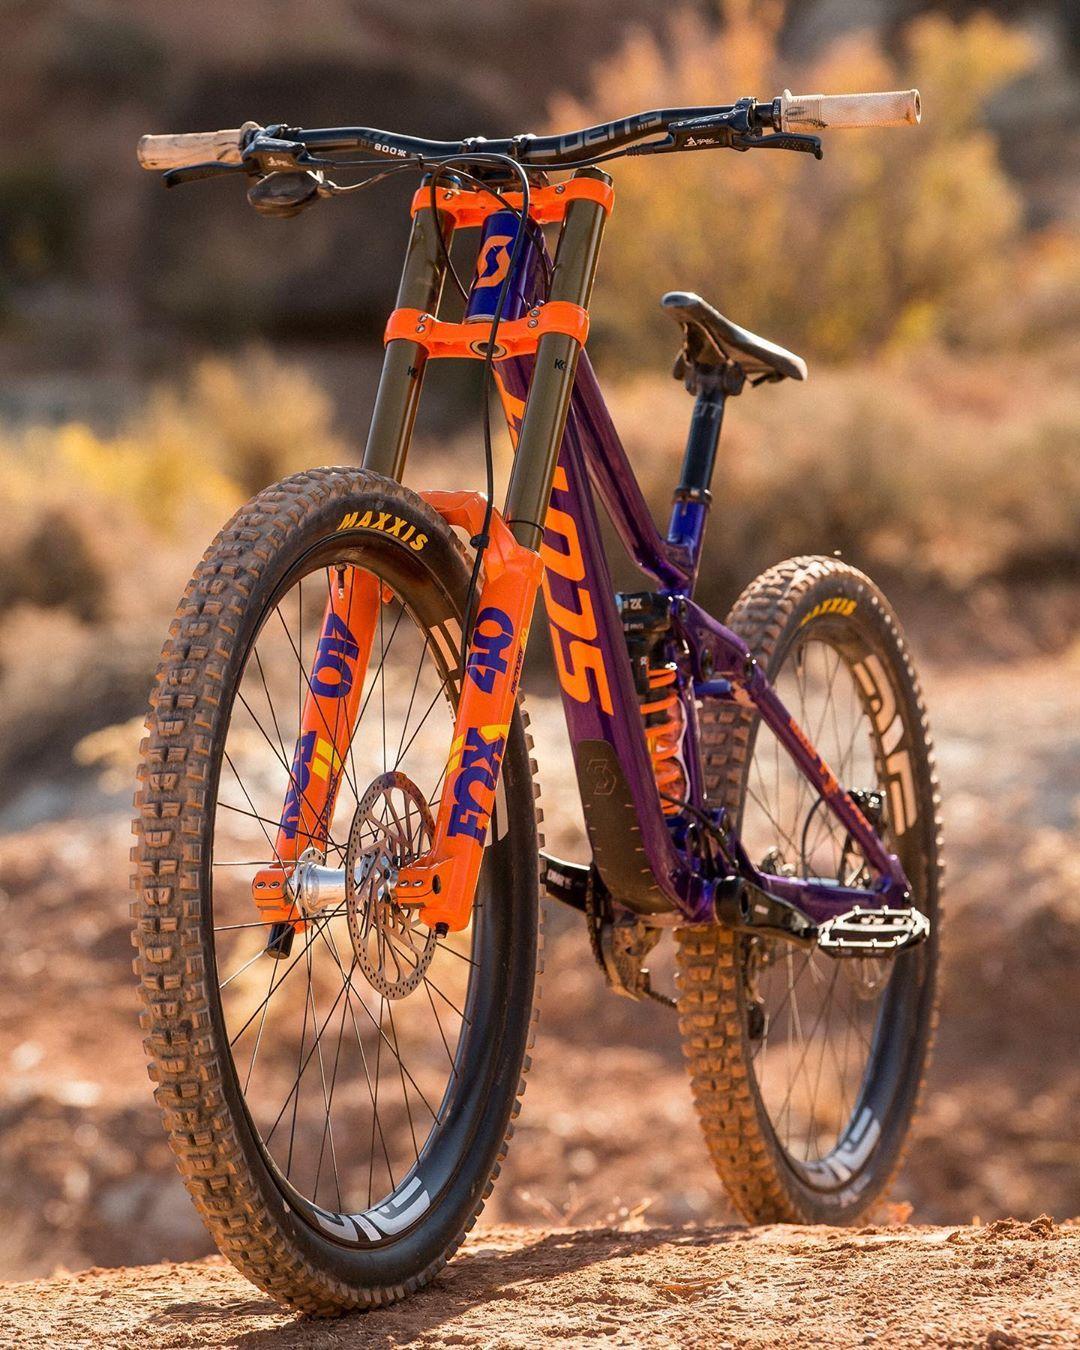 Here She Is Redbullrampage Ready Iancollinsphotography Bike Mtb Therock Utah Gnar Downhill Bike Mountain Bike Art Freeride Bikes